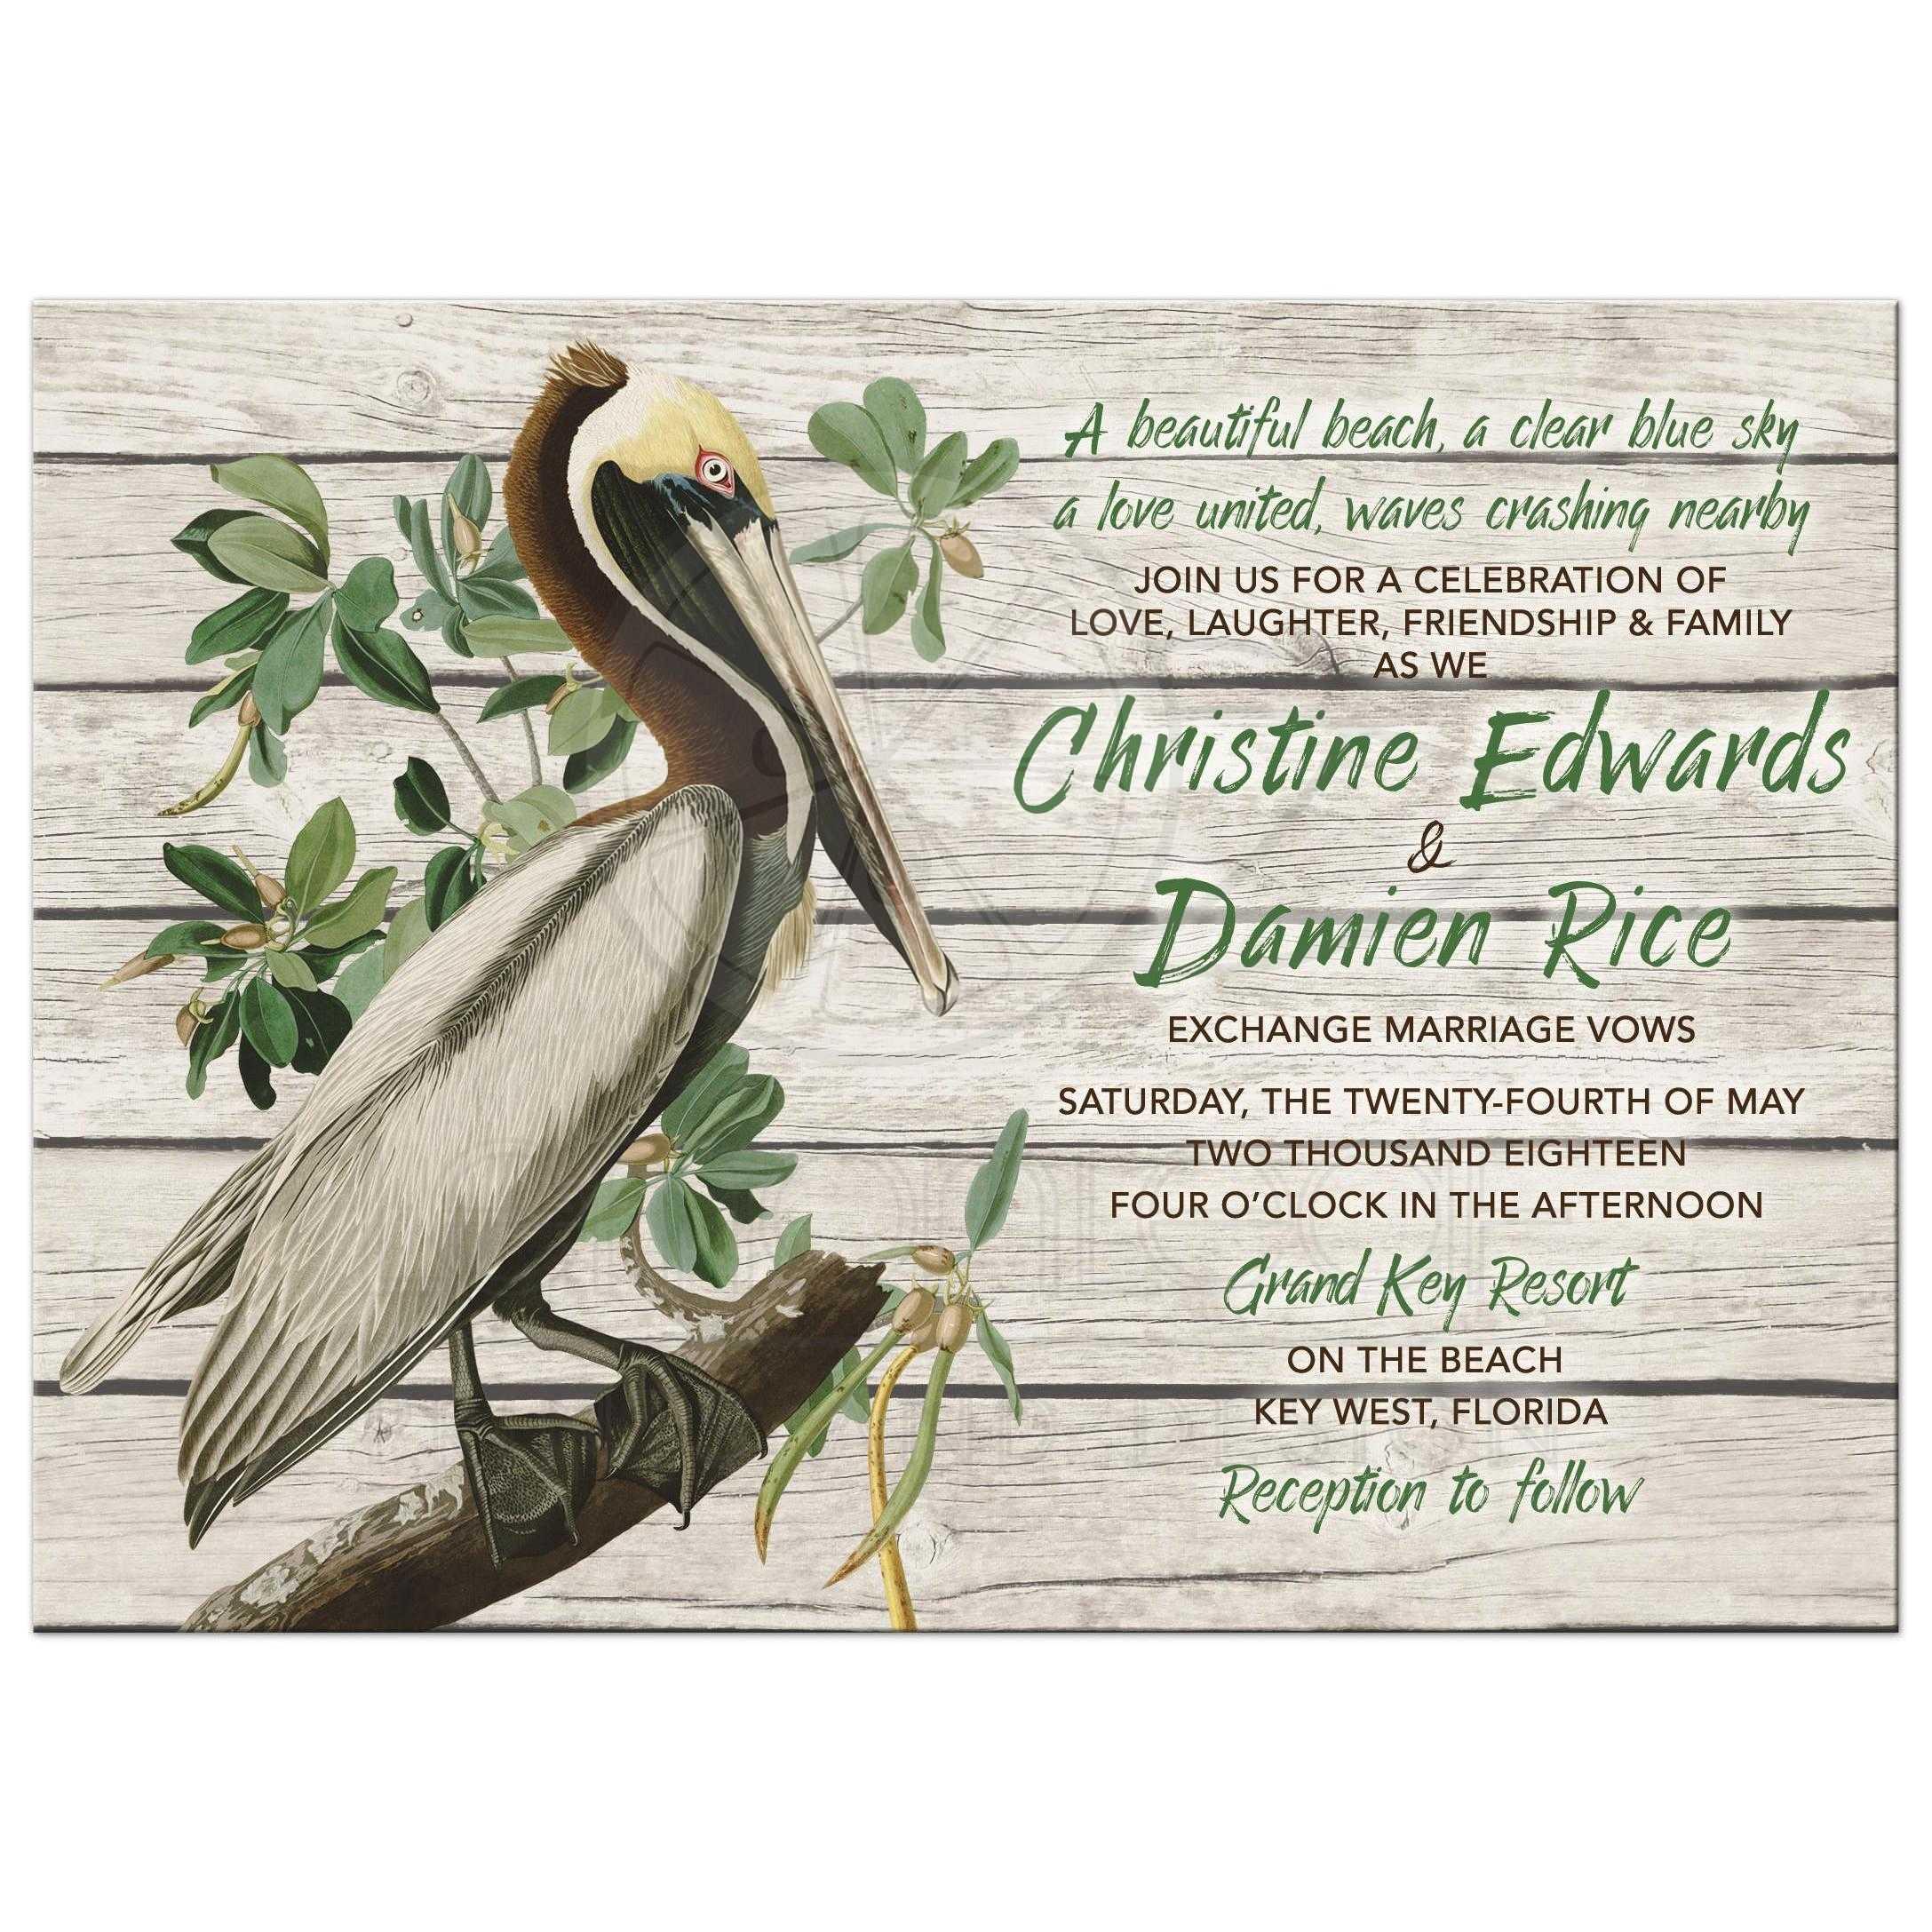 Vintage Beach Wedding Invitations: Rustic Pelican Destination Or Beach Wedding Invitation